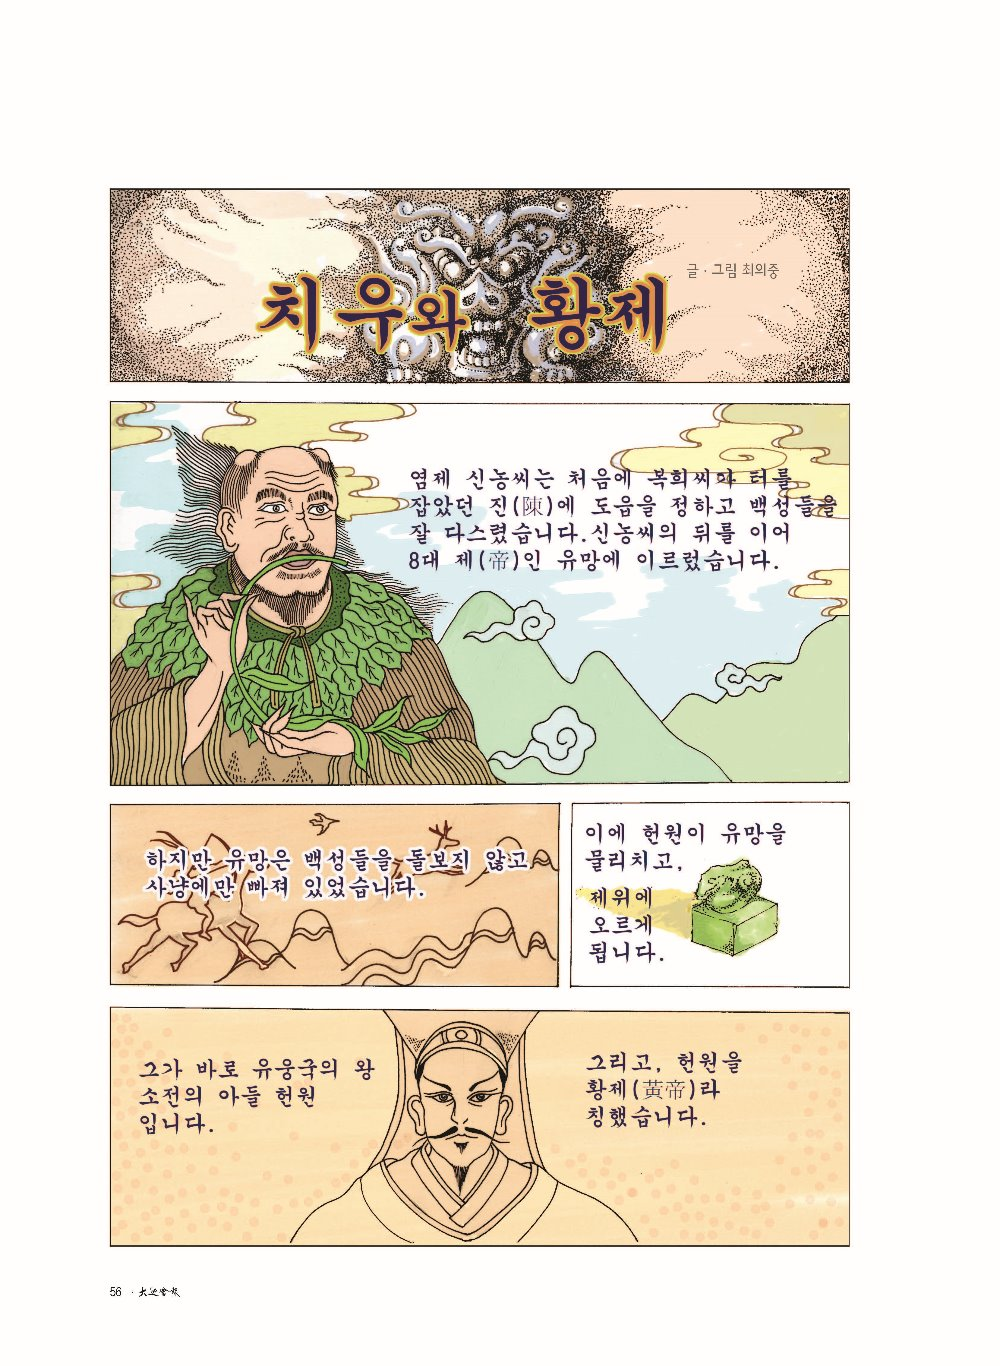 Daesoon_155_만화_페이지_1.jpg